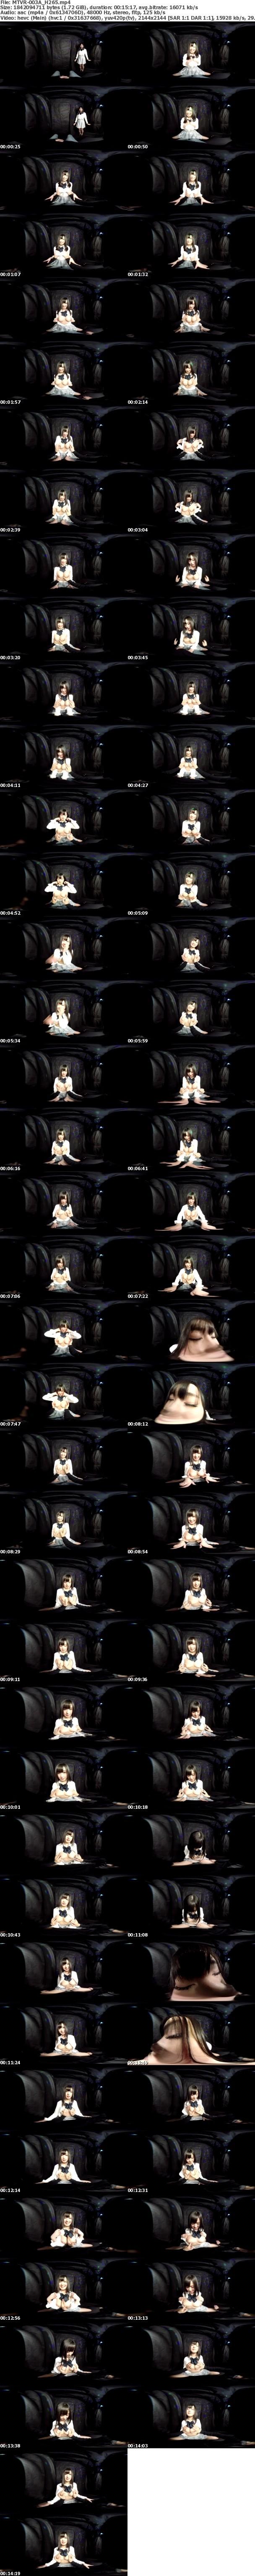 VR/3D MTVR-003 【VR】AV女優が在籍すると噂の『おっぱいパブ』と『ピンサロ』 星空もあ